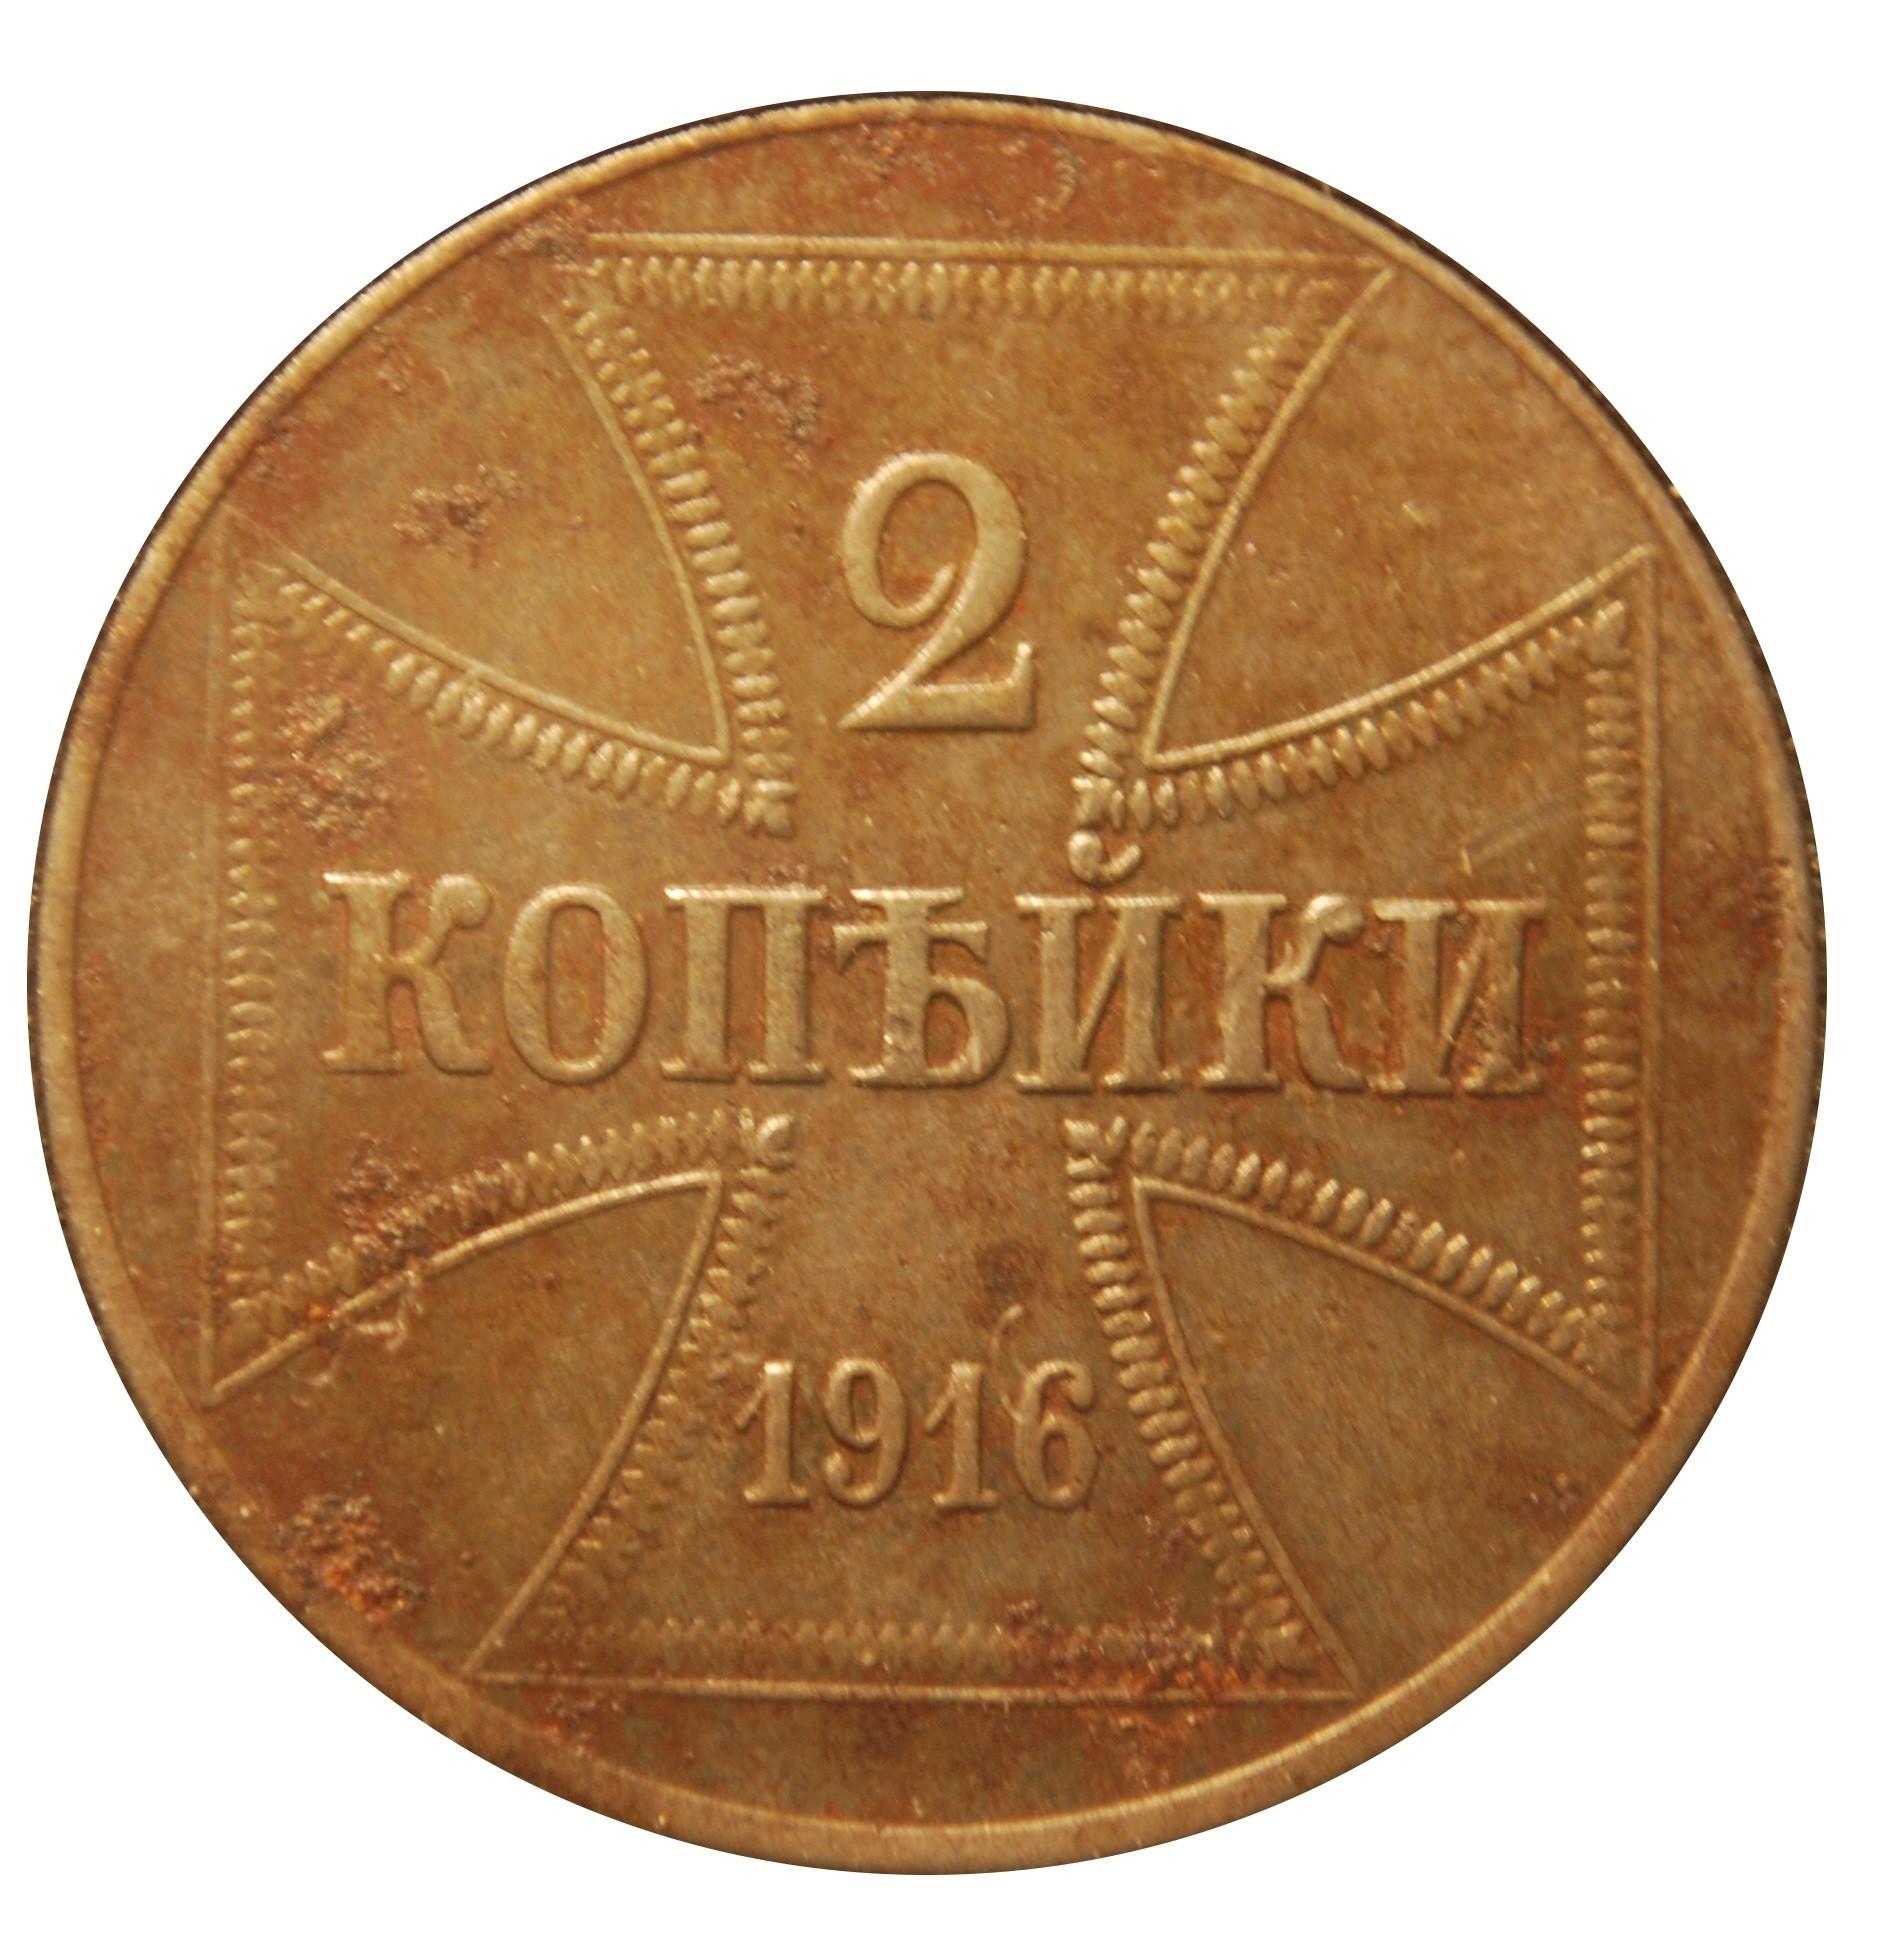 Germany 2 Kopecks (1916 Wilhelm II Military Coinage)